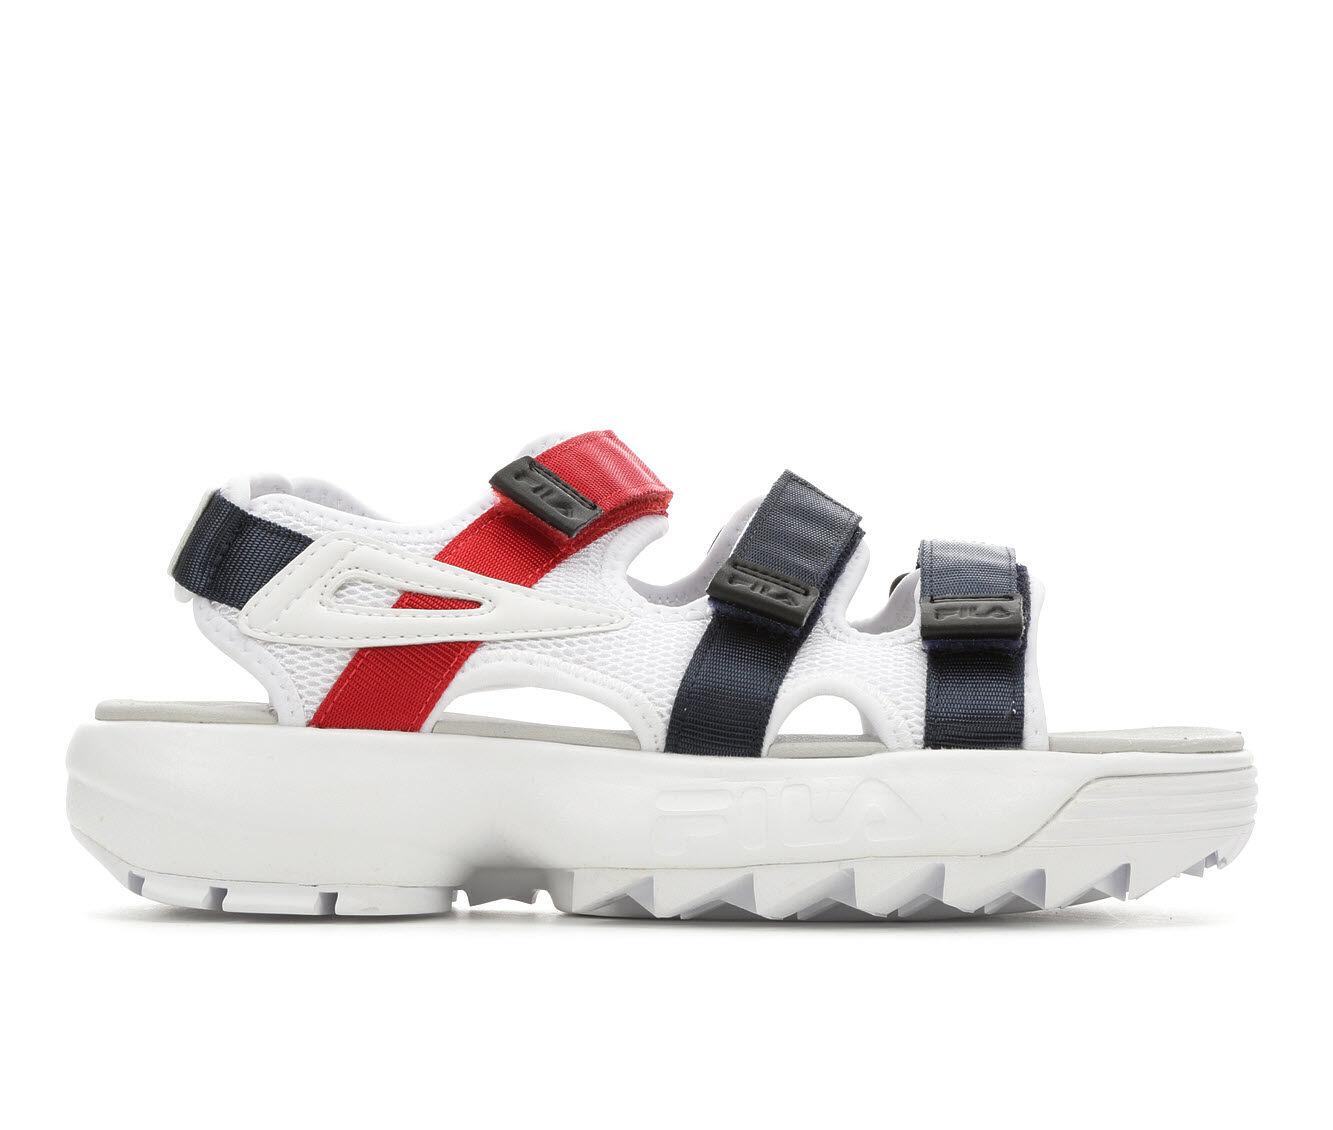 First Choice Women's Fila Disruptor Sandal Flatform Sandals White/Navy/Rd